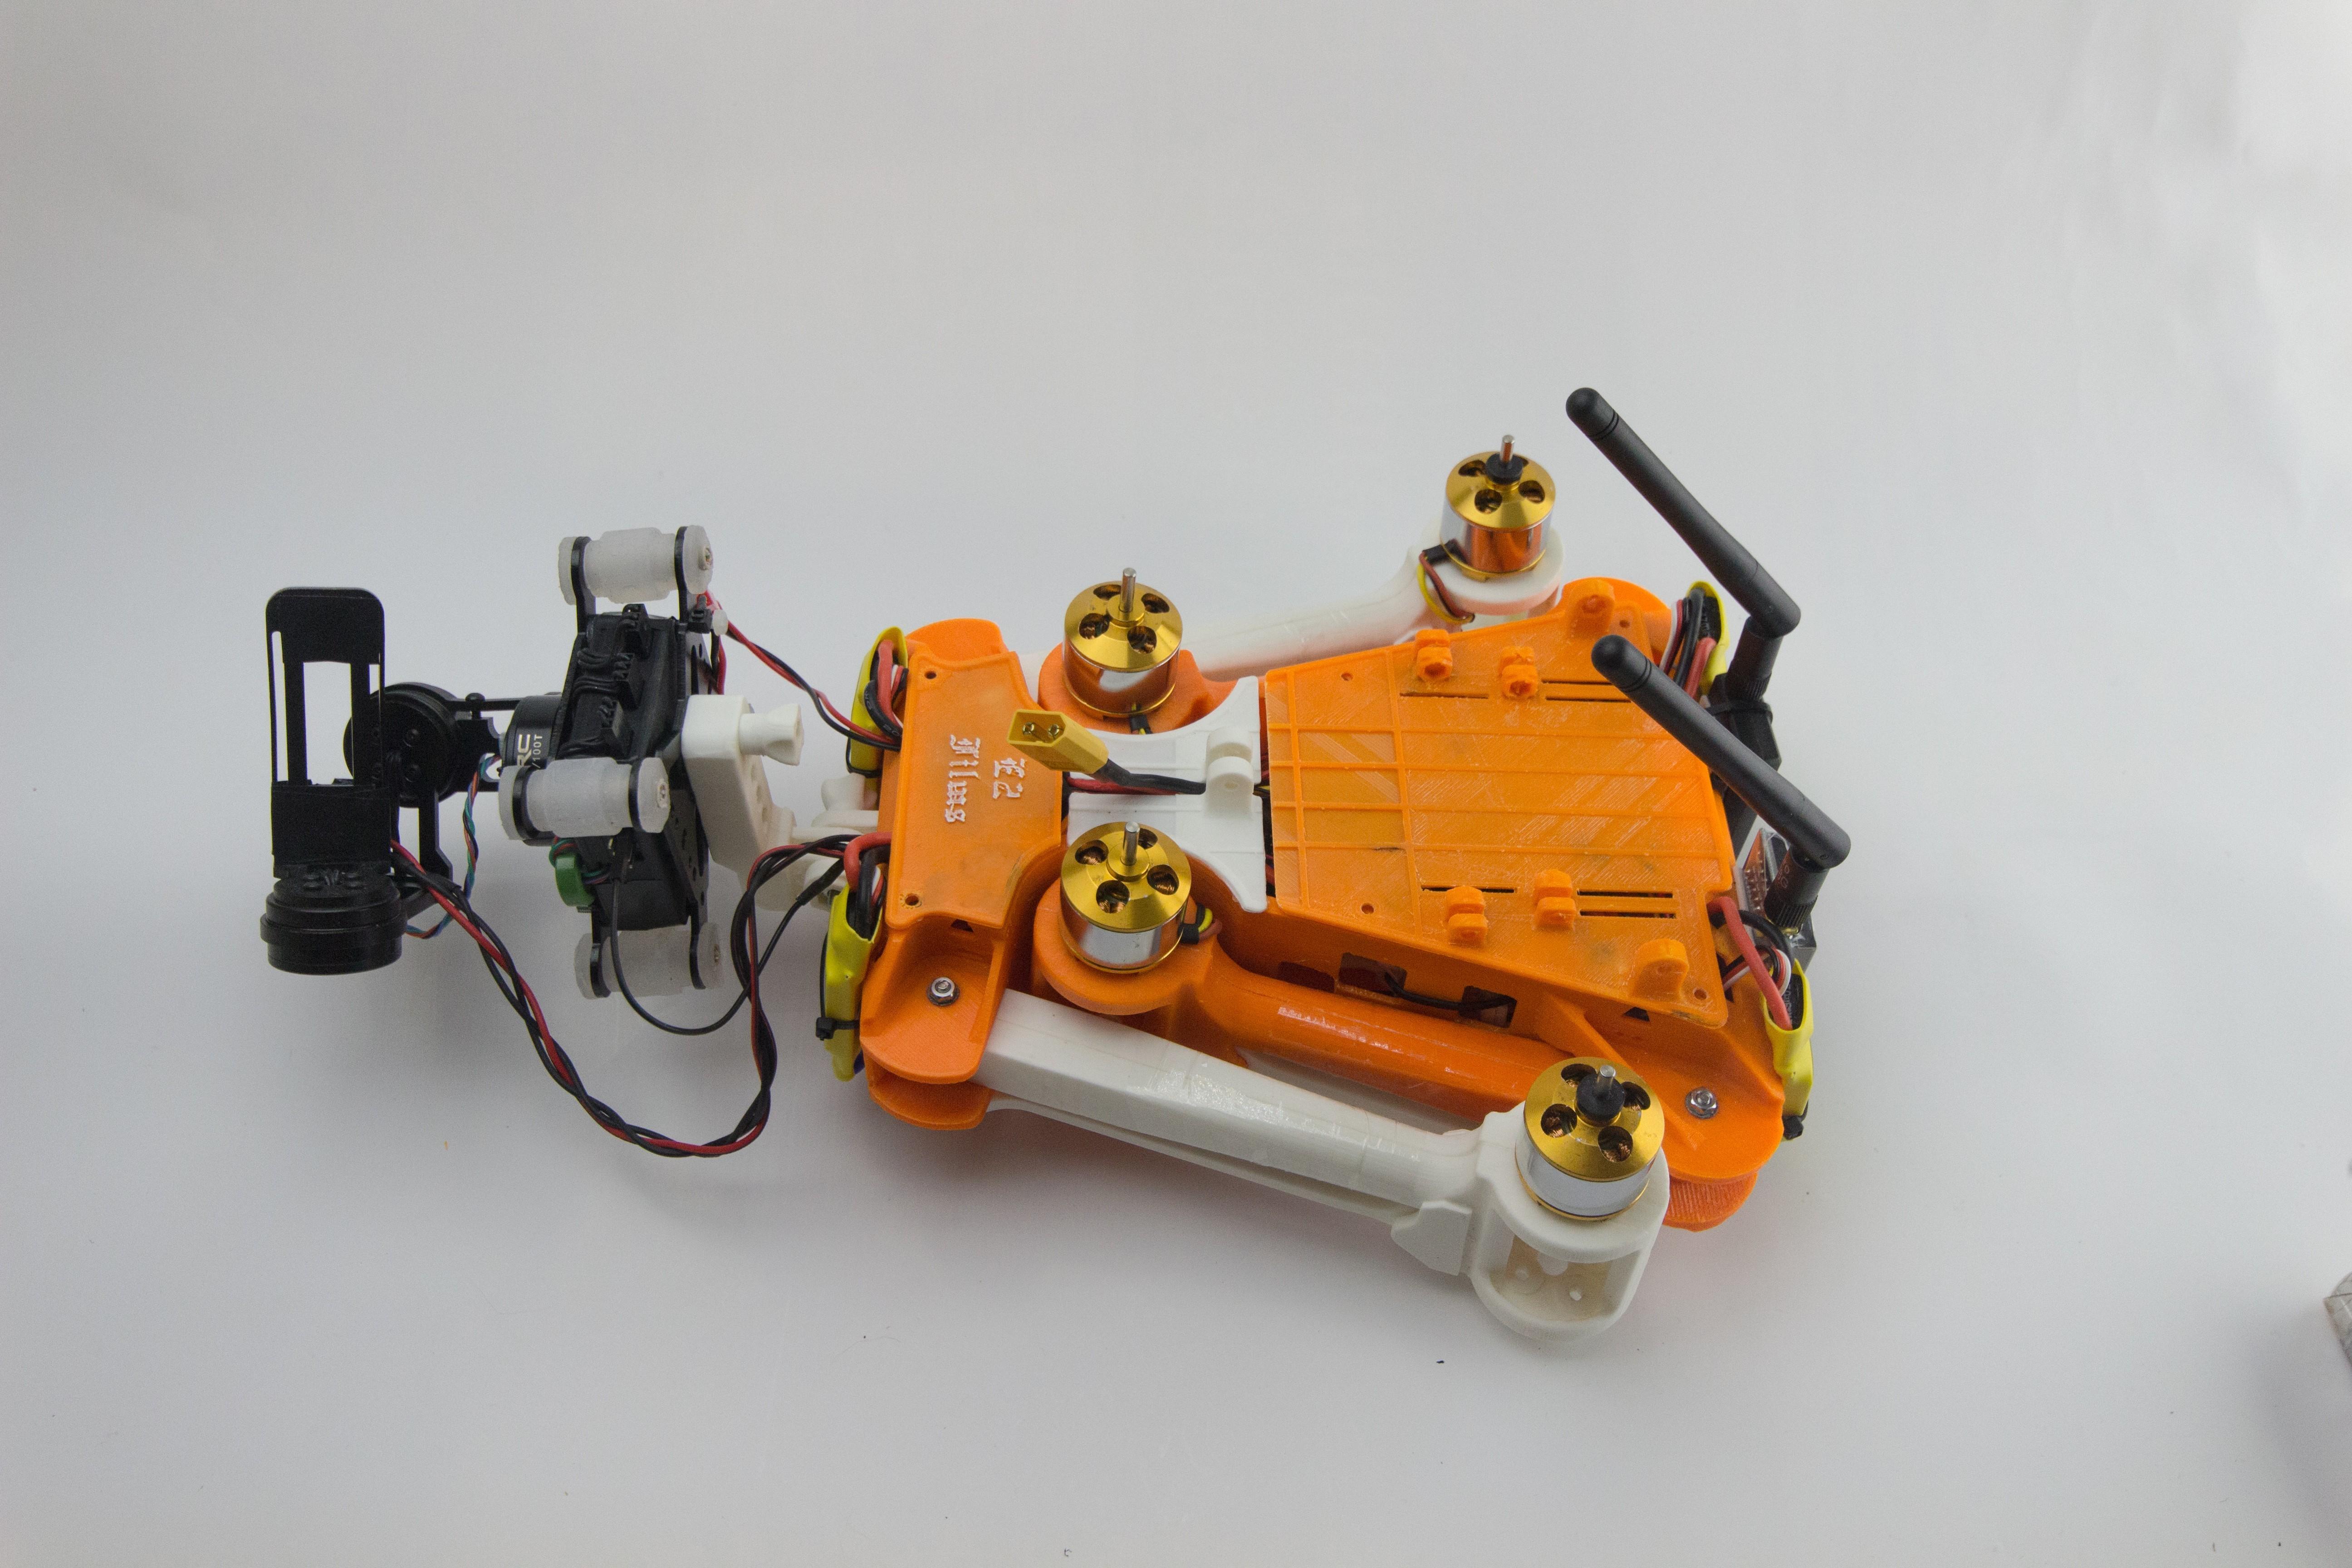 IMG_8293.jpg Download STL file Folding Quadcopter 450 Frame • 3D print object, AleksandrDolzhenko